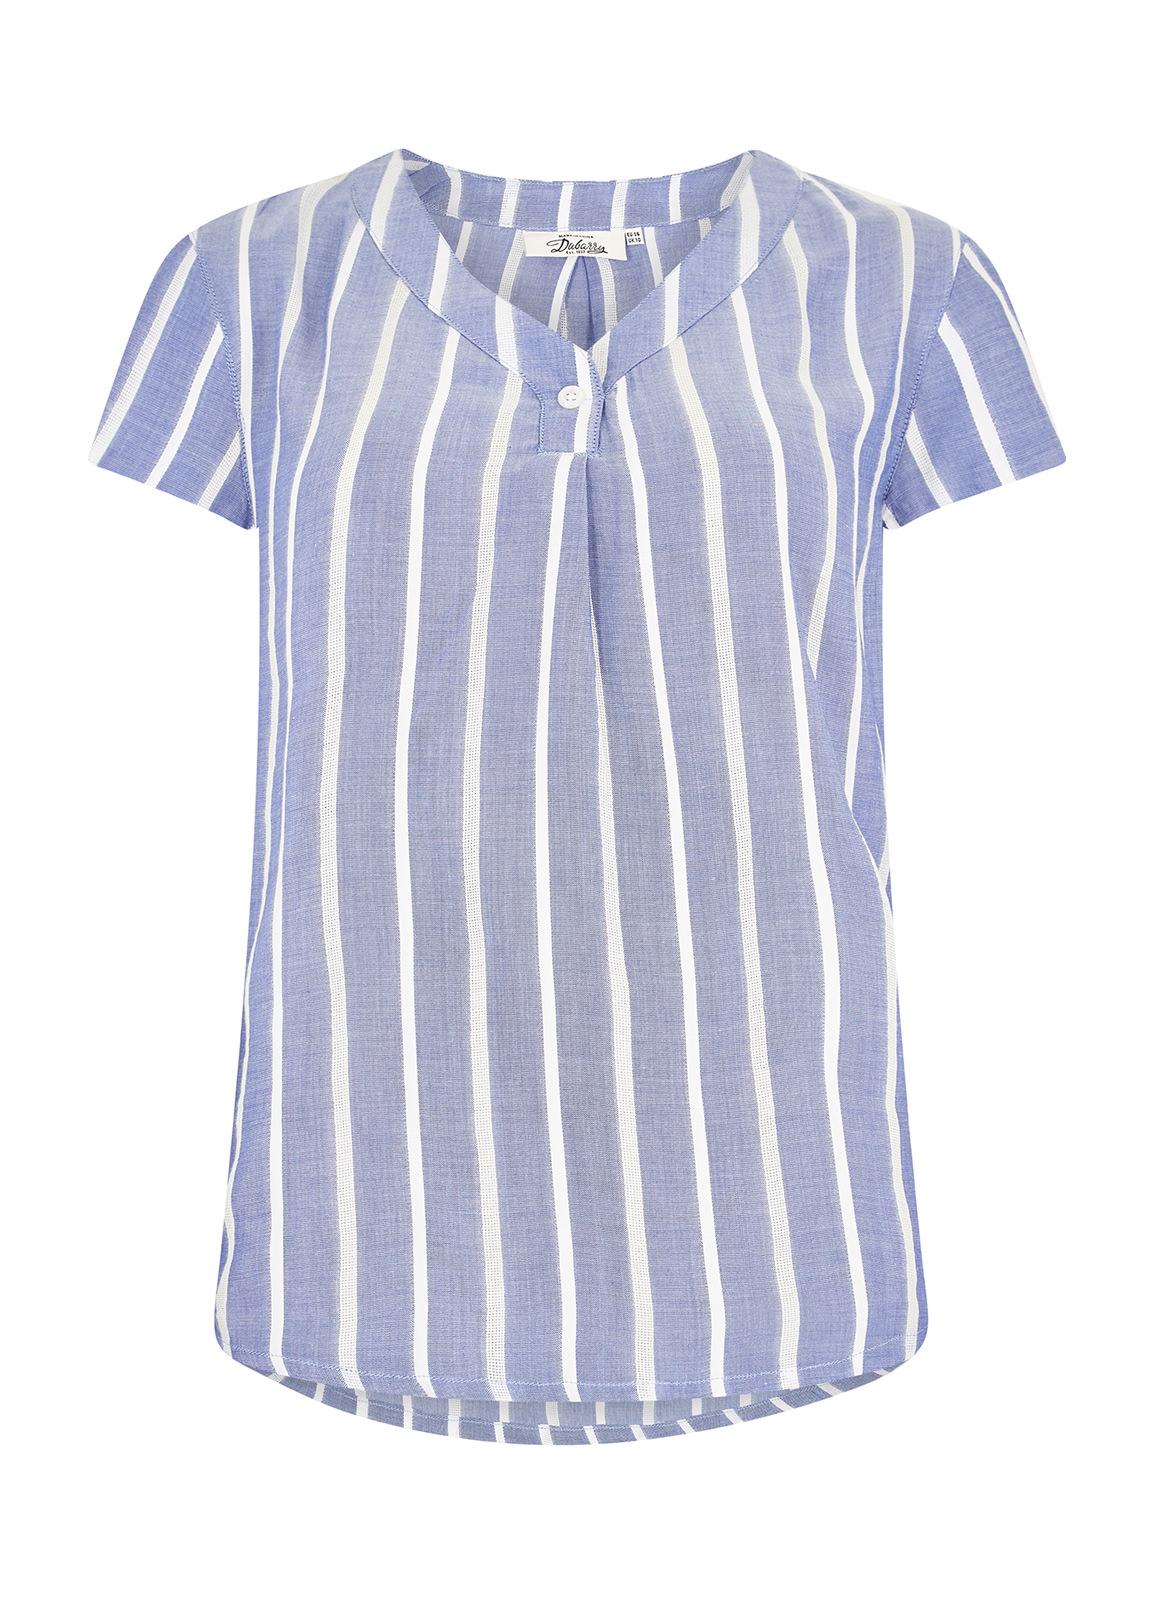 Dubarry_Gardenia Shirt - Royal Blue_Image_2